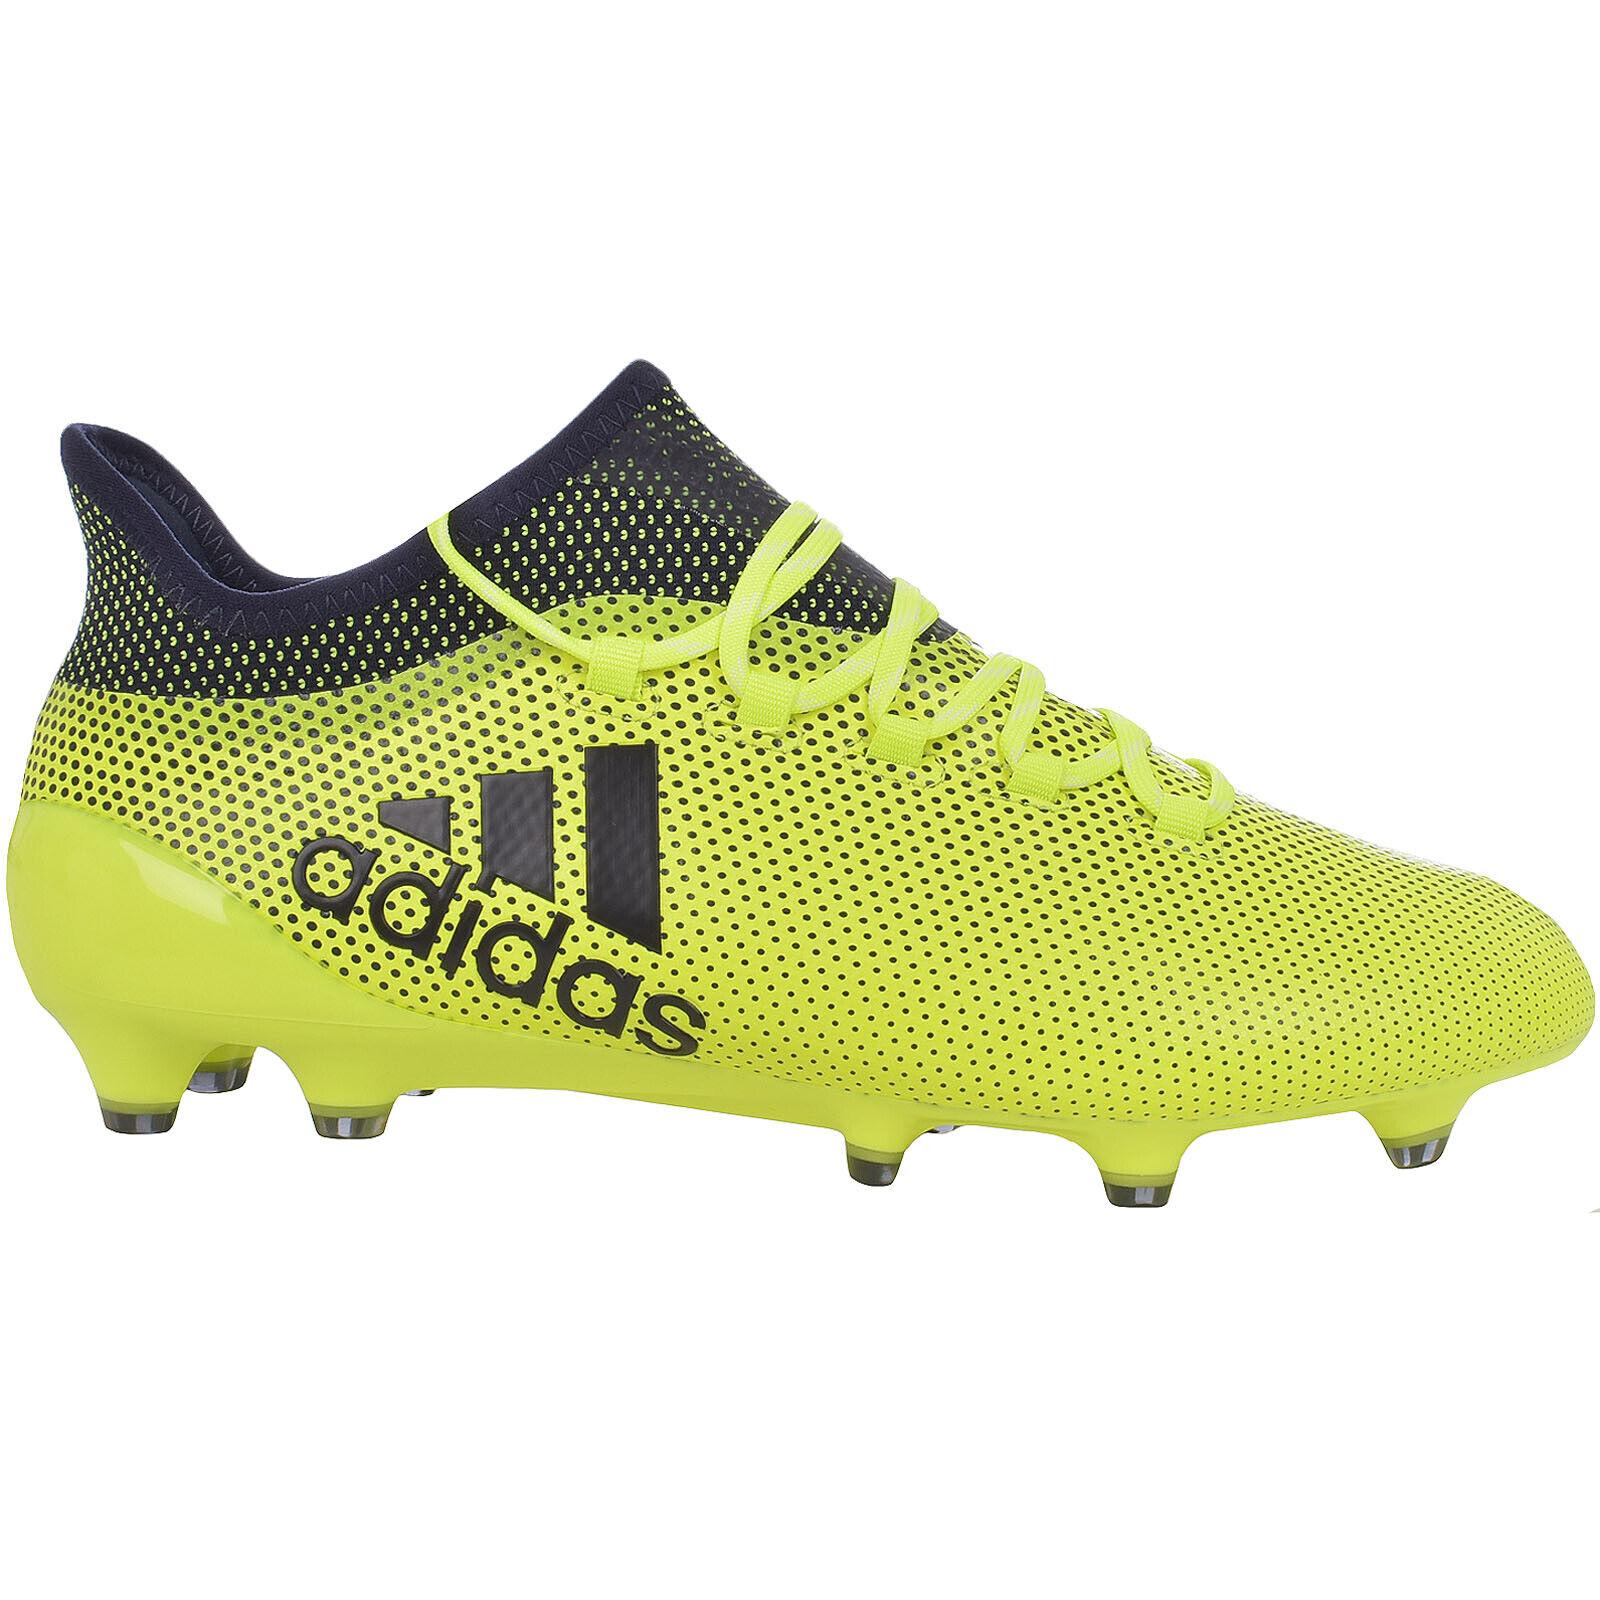 Adidas Performance Mens X 17.1 FG Football Sports botas zapatos - amarillo